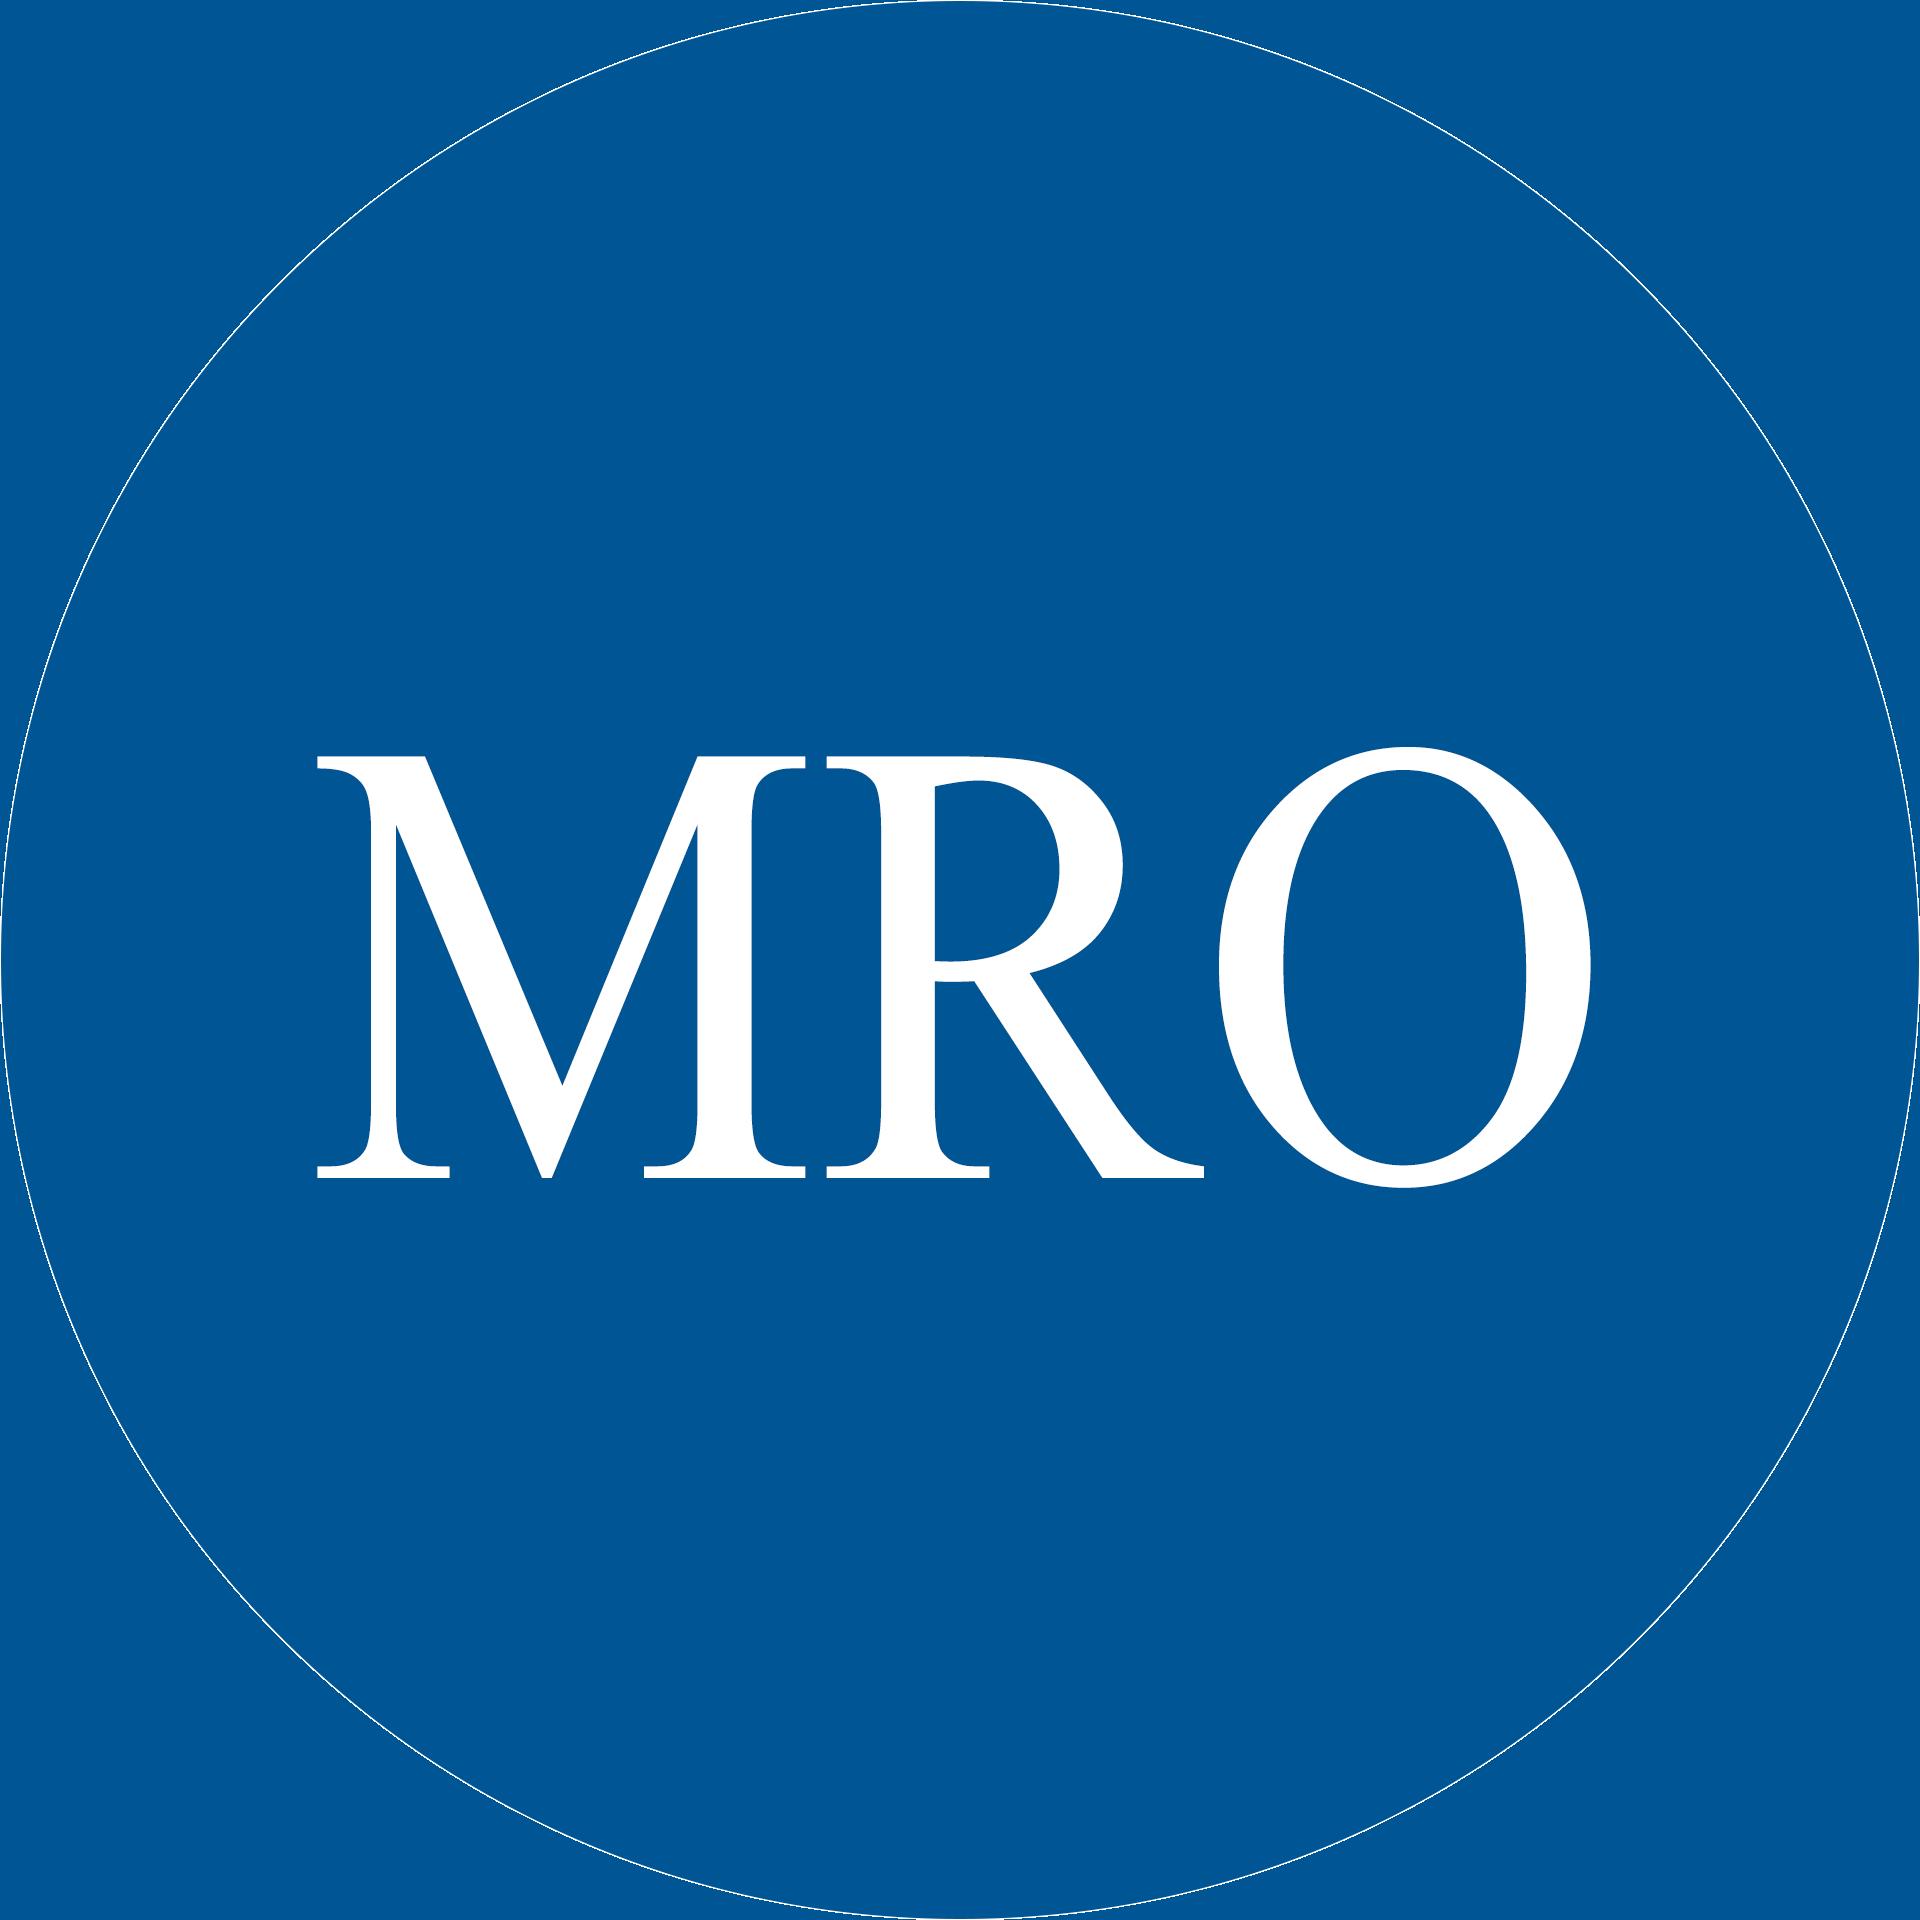 av8 mro services 90 Logo